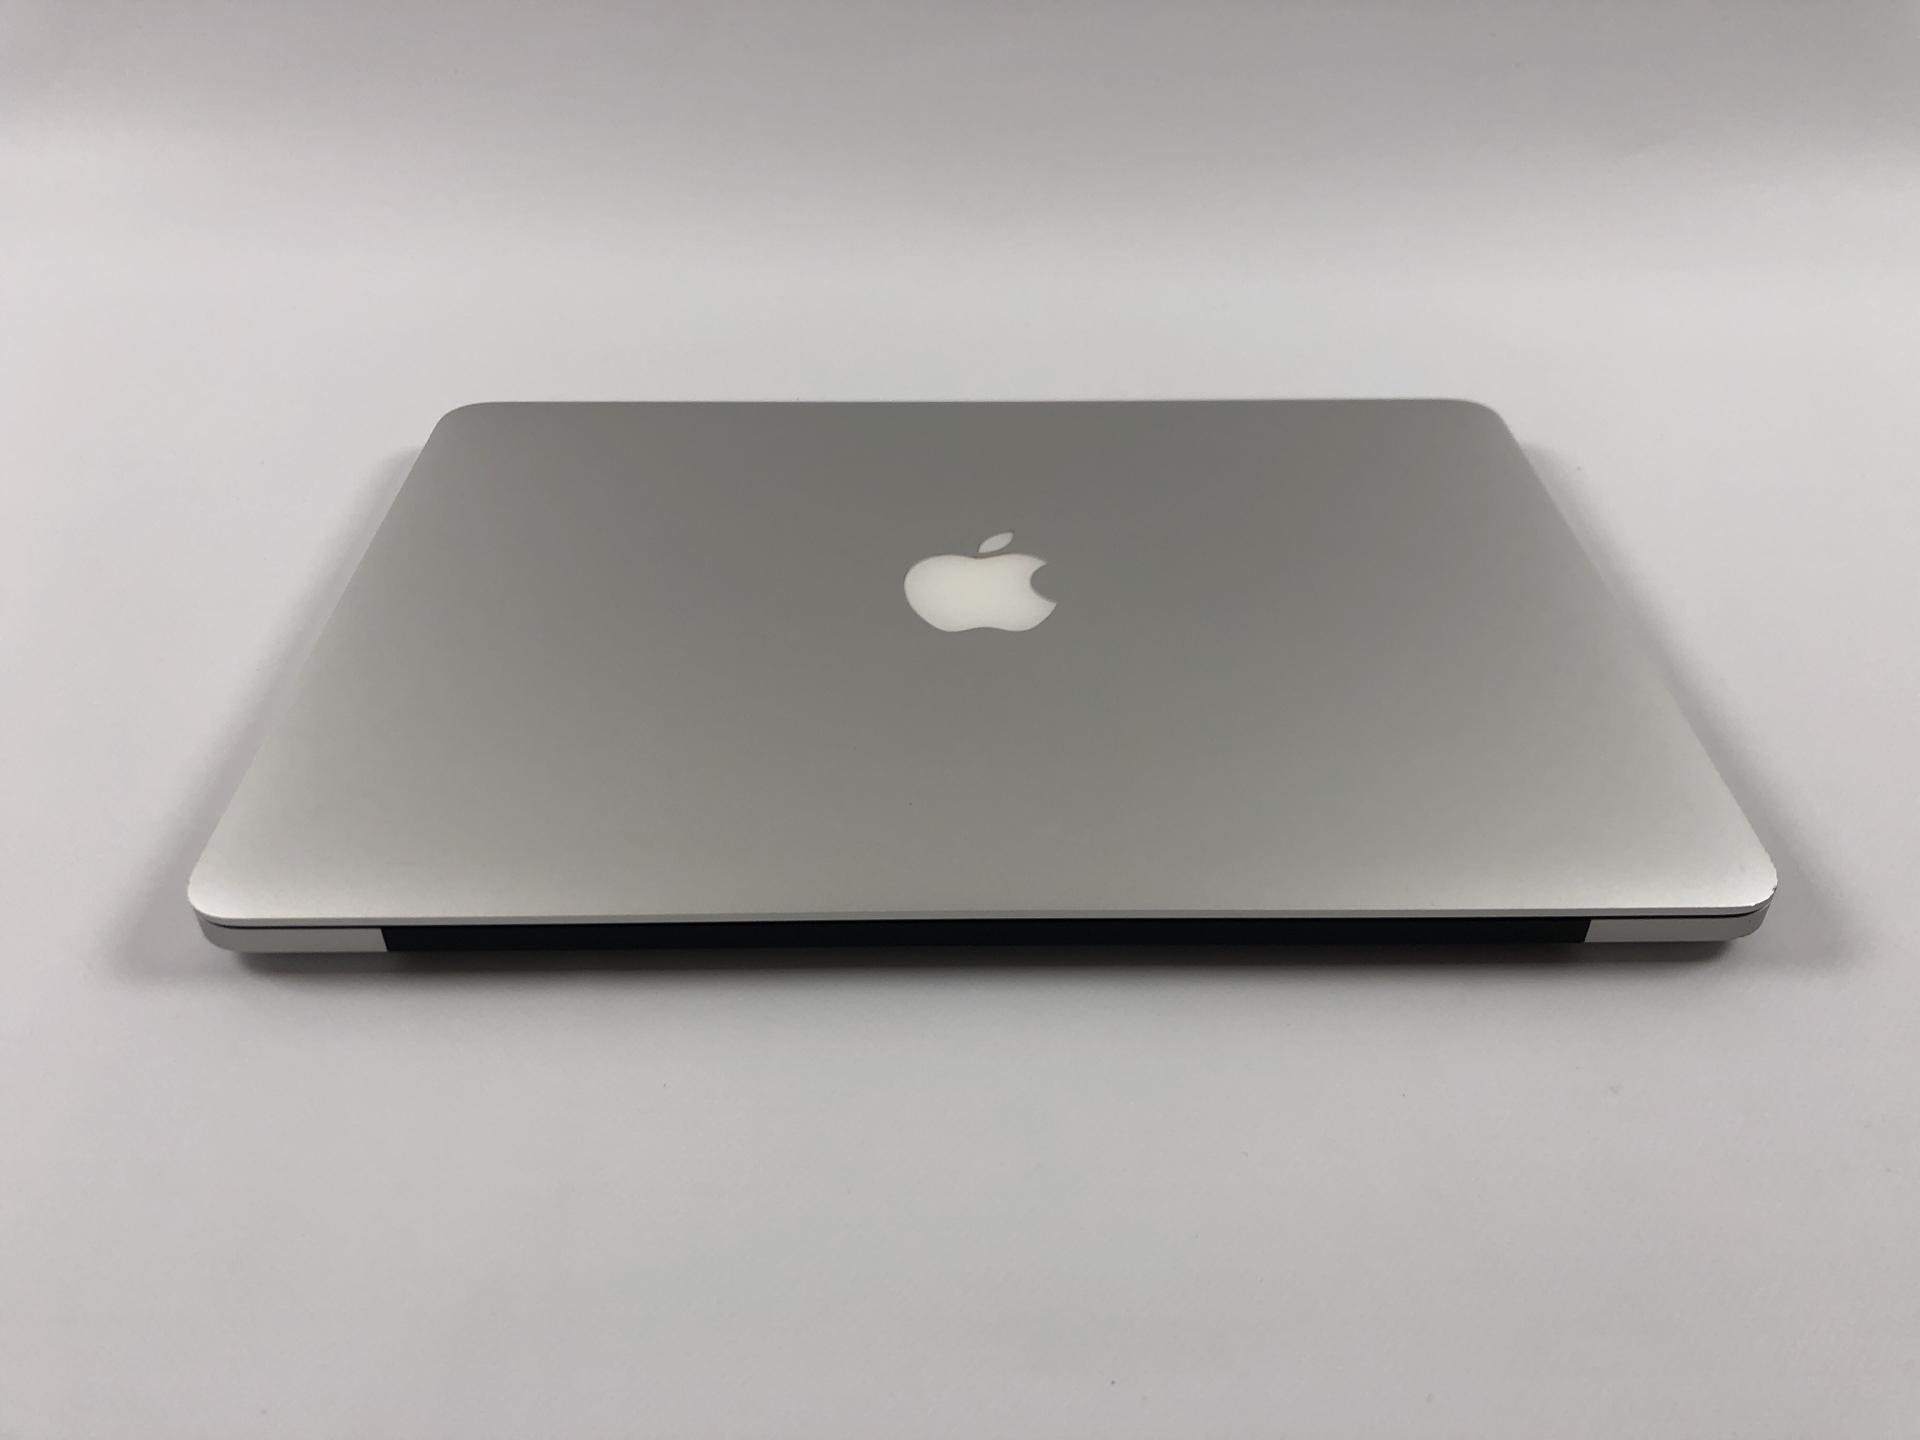 "MacBook Pro Retina 13"" Early 2015 (Intel Core i5 2.7 GHz 16 GB RAM 128 GB SSD), Intel Core i5 2.7 GHz, 16 GB RAM, 128 GB SSD, bild 2"